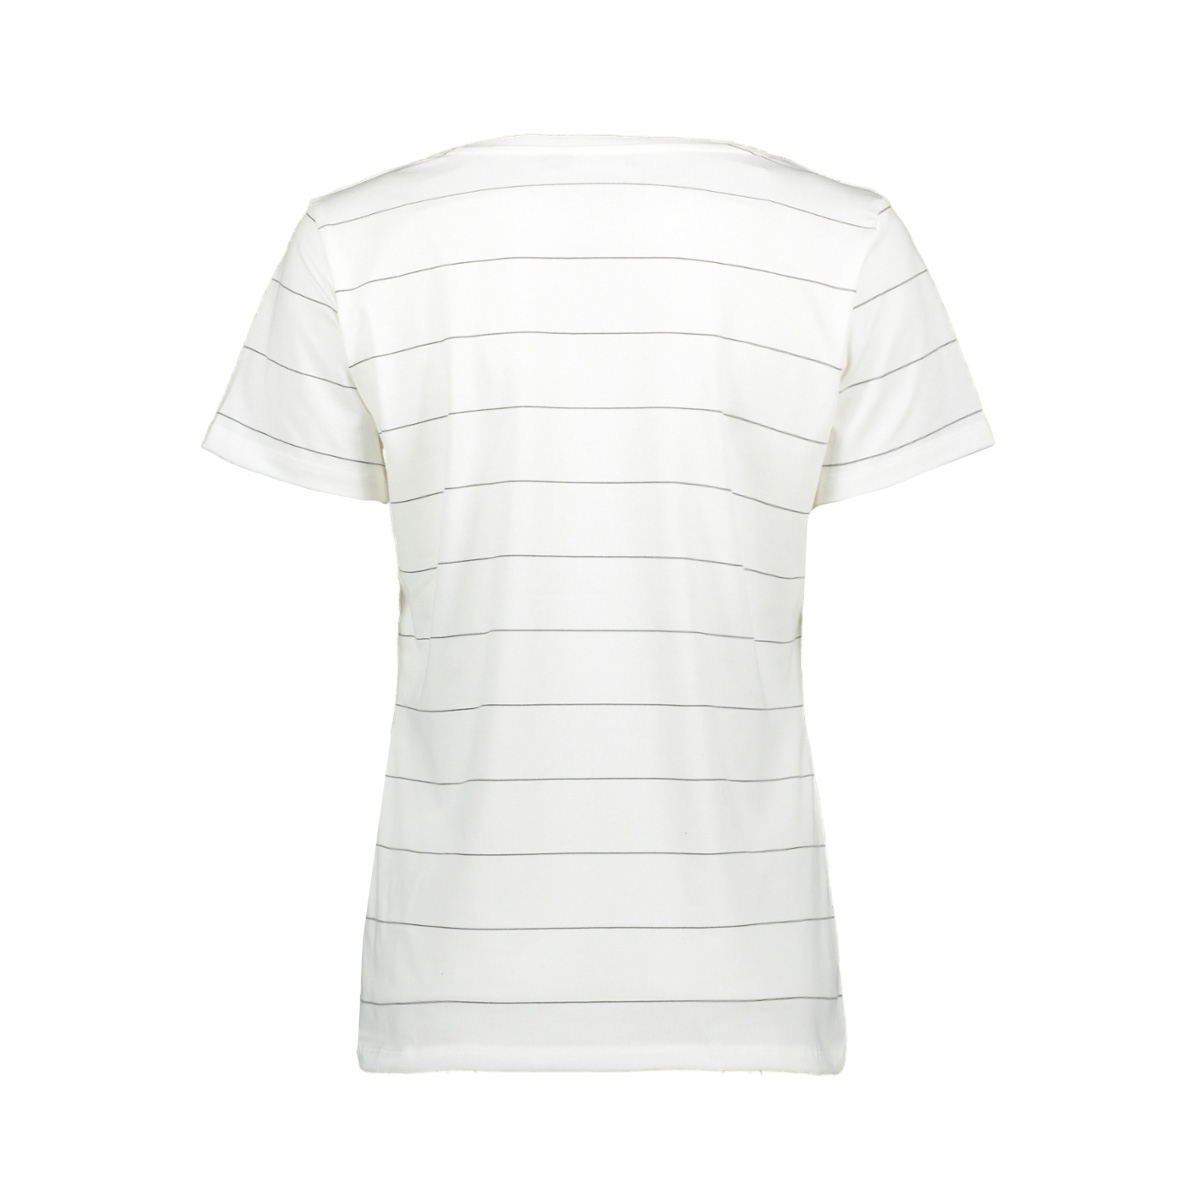 t shirt sil vous plait ss 02067 41 geisha t-shirt white/black/gold